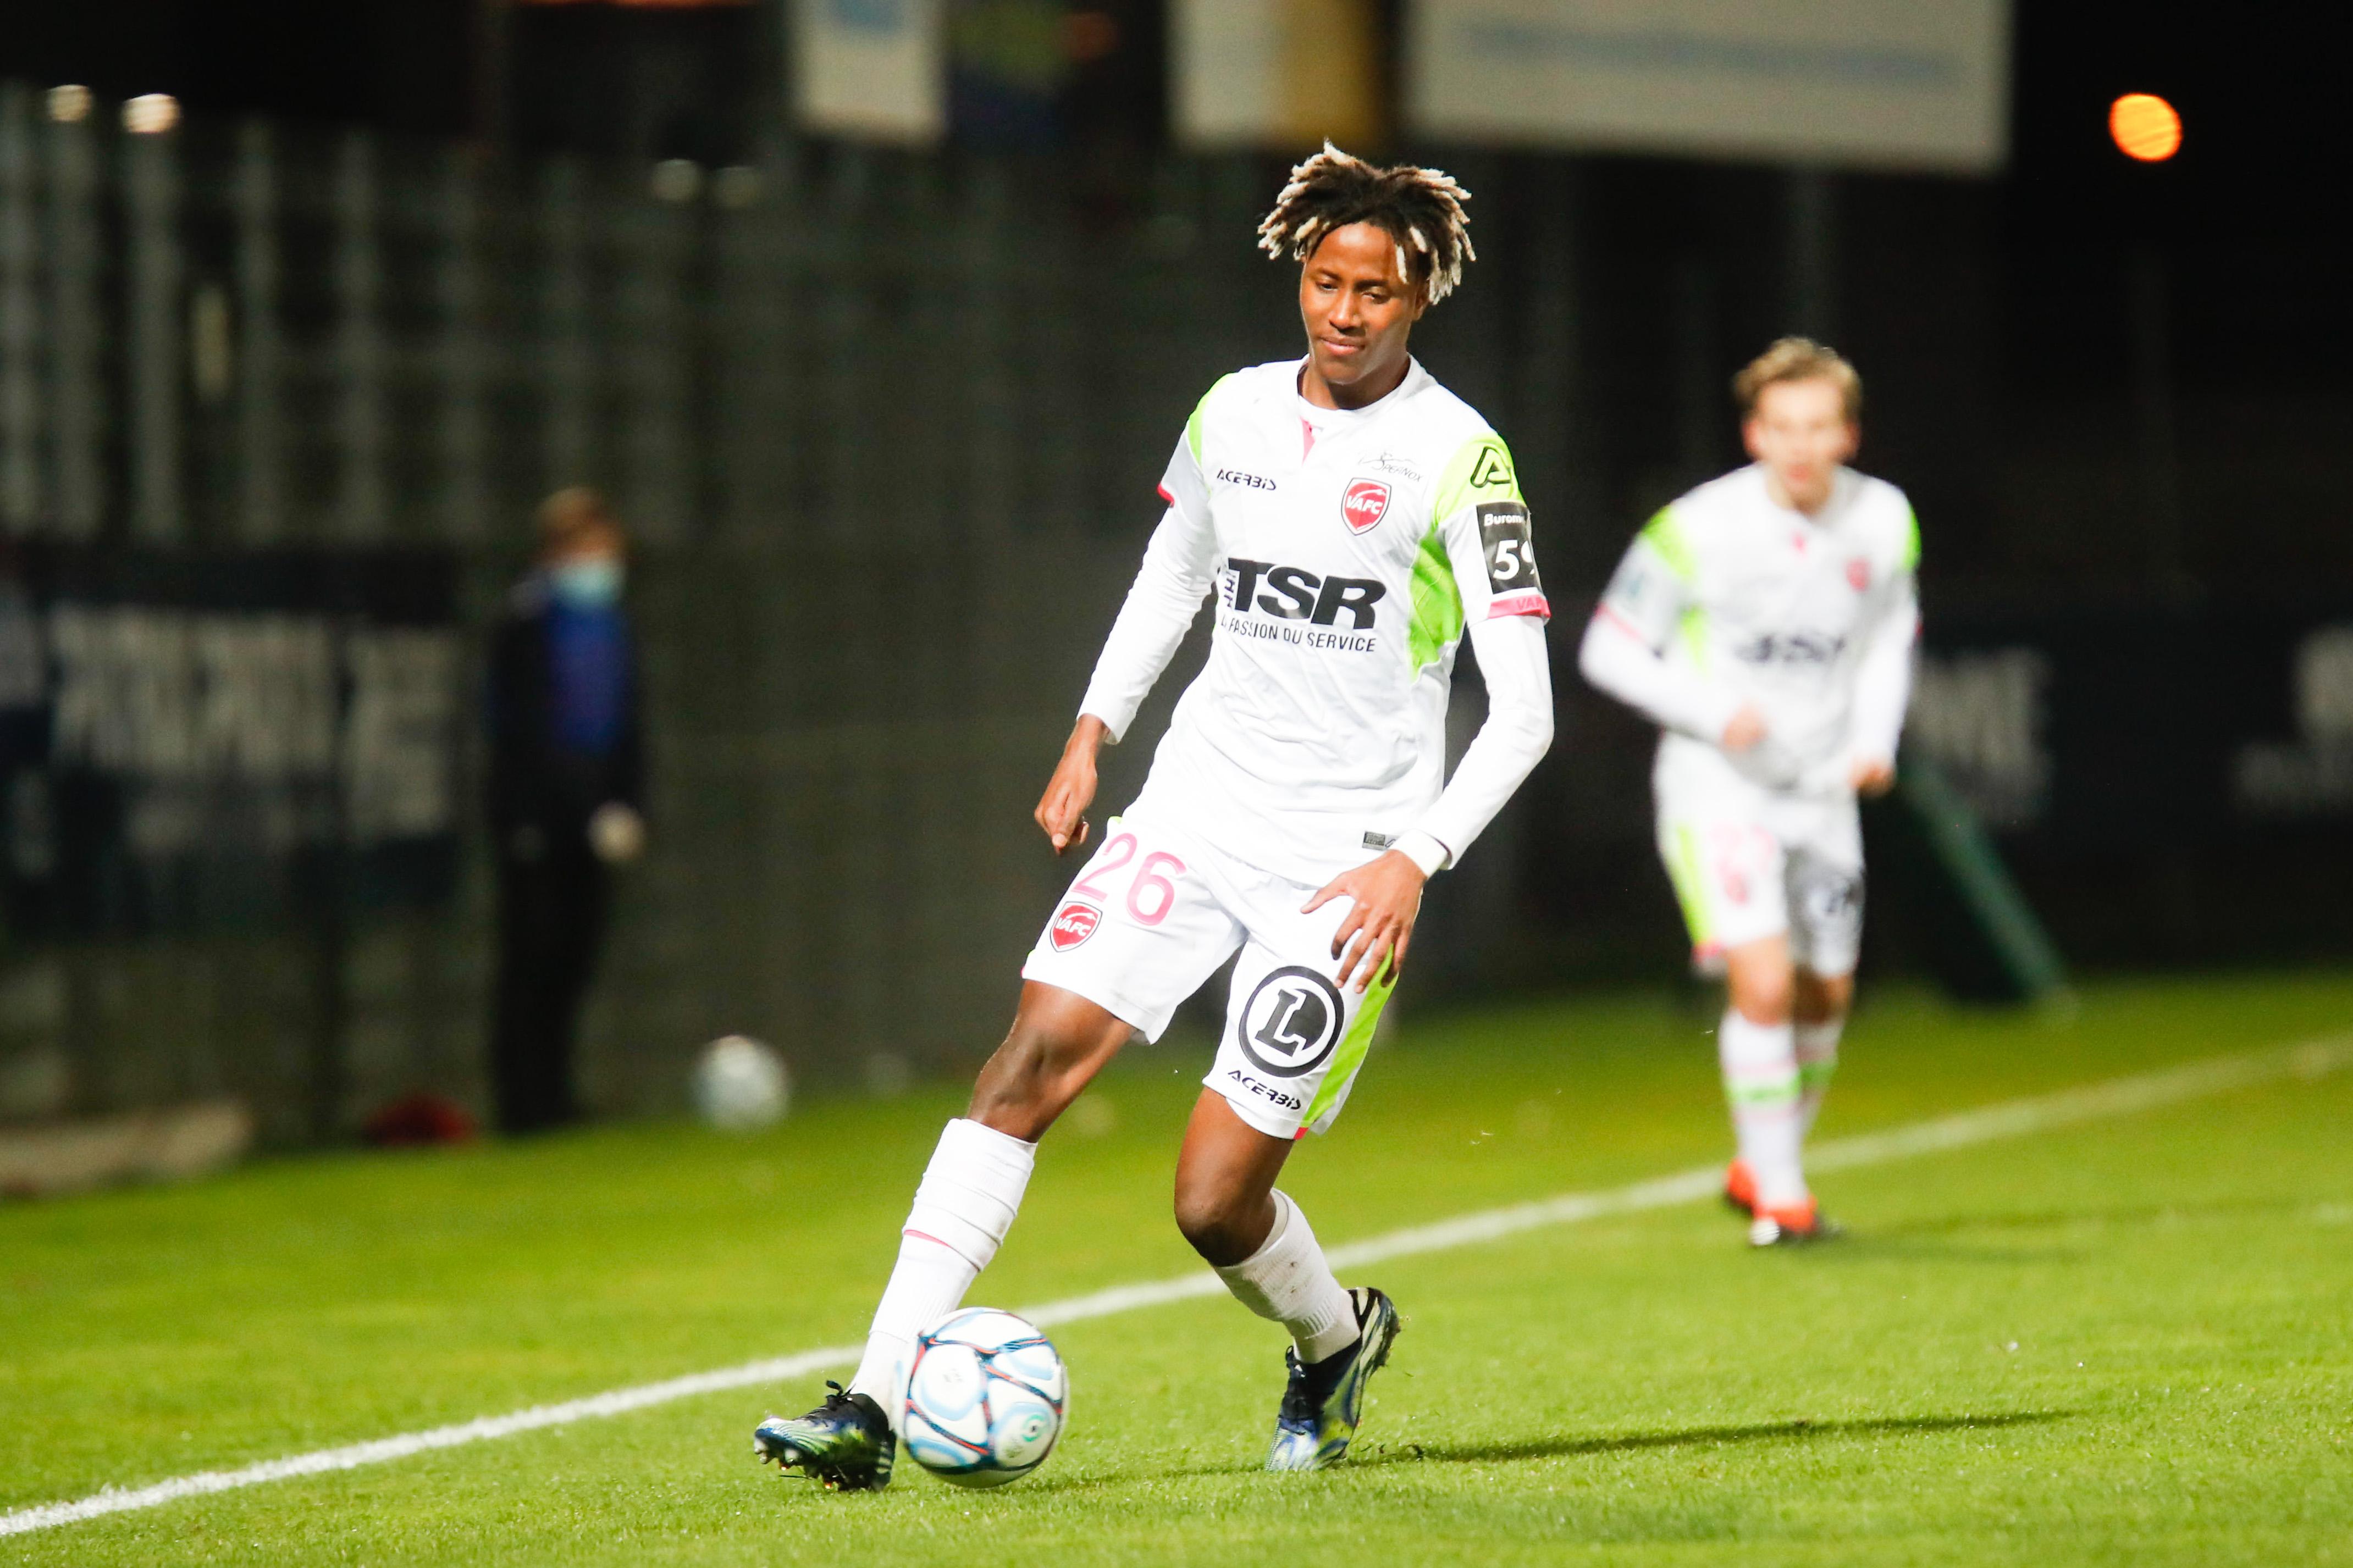 Clermont Foot 63 v Valenciennes Football Club - Ligue 2 BKT